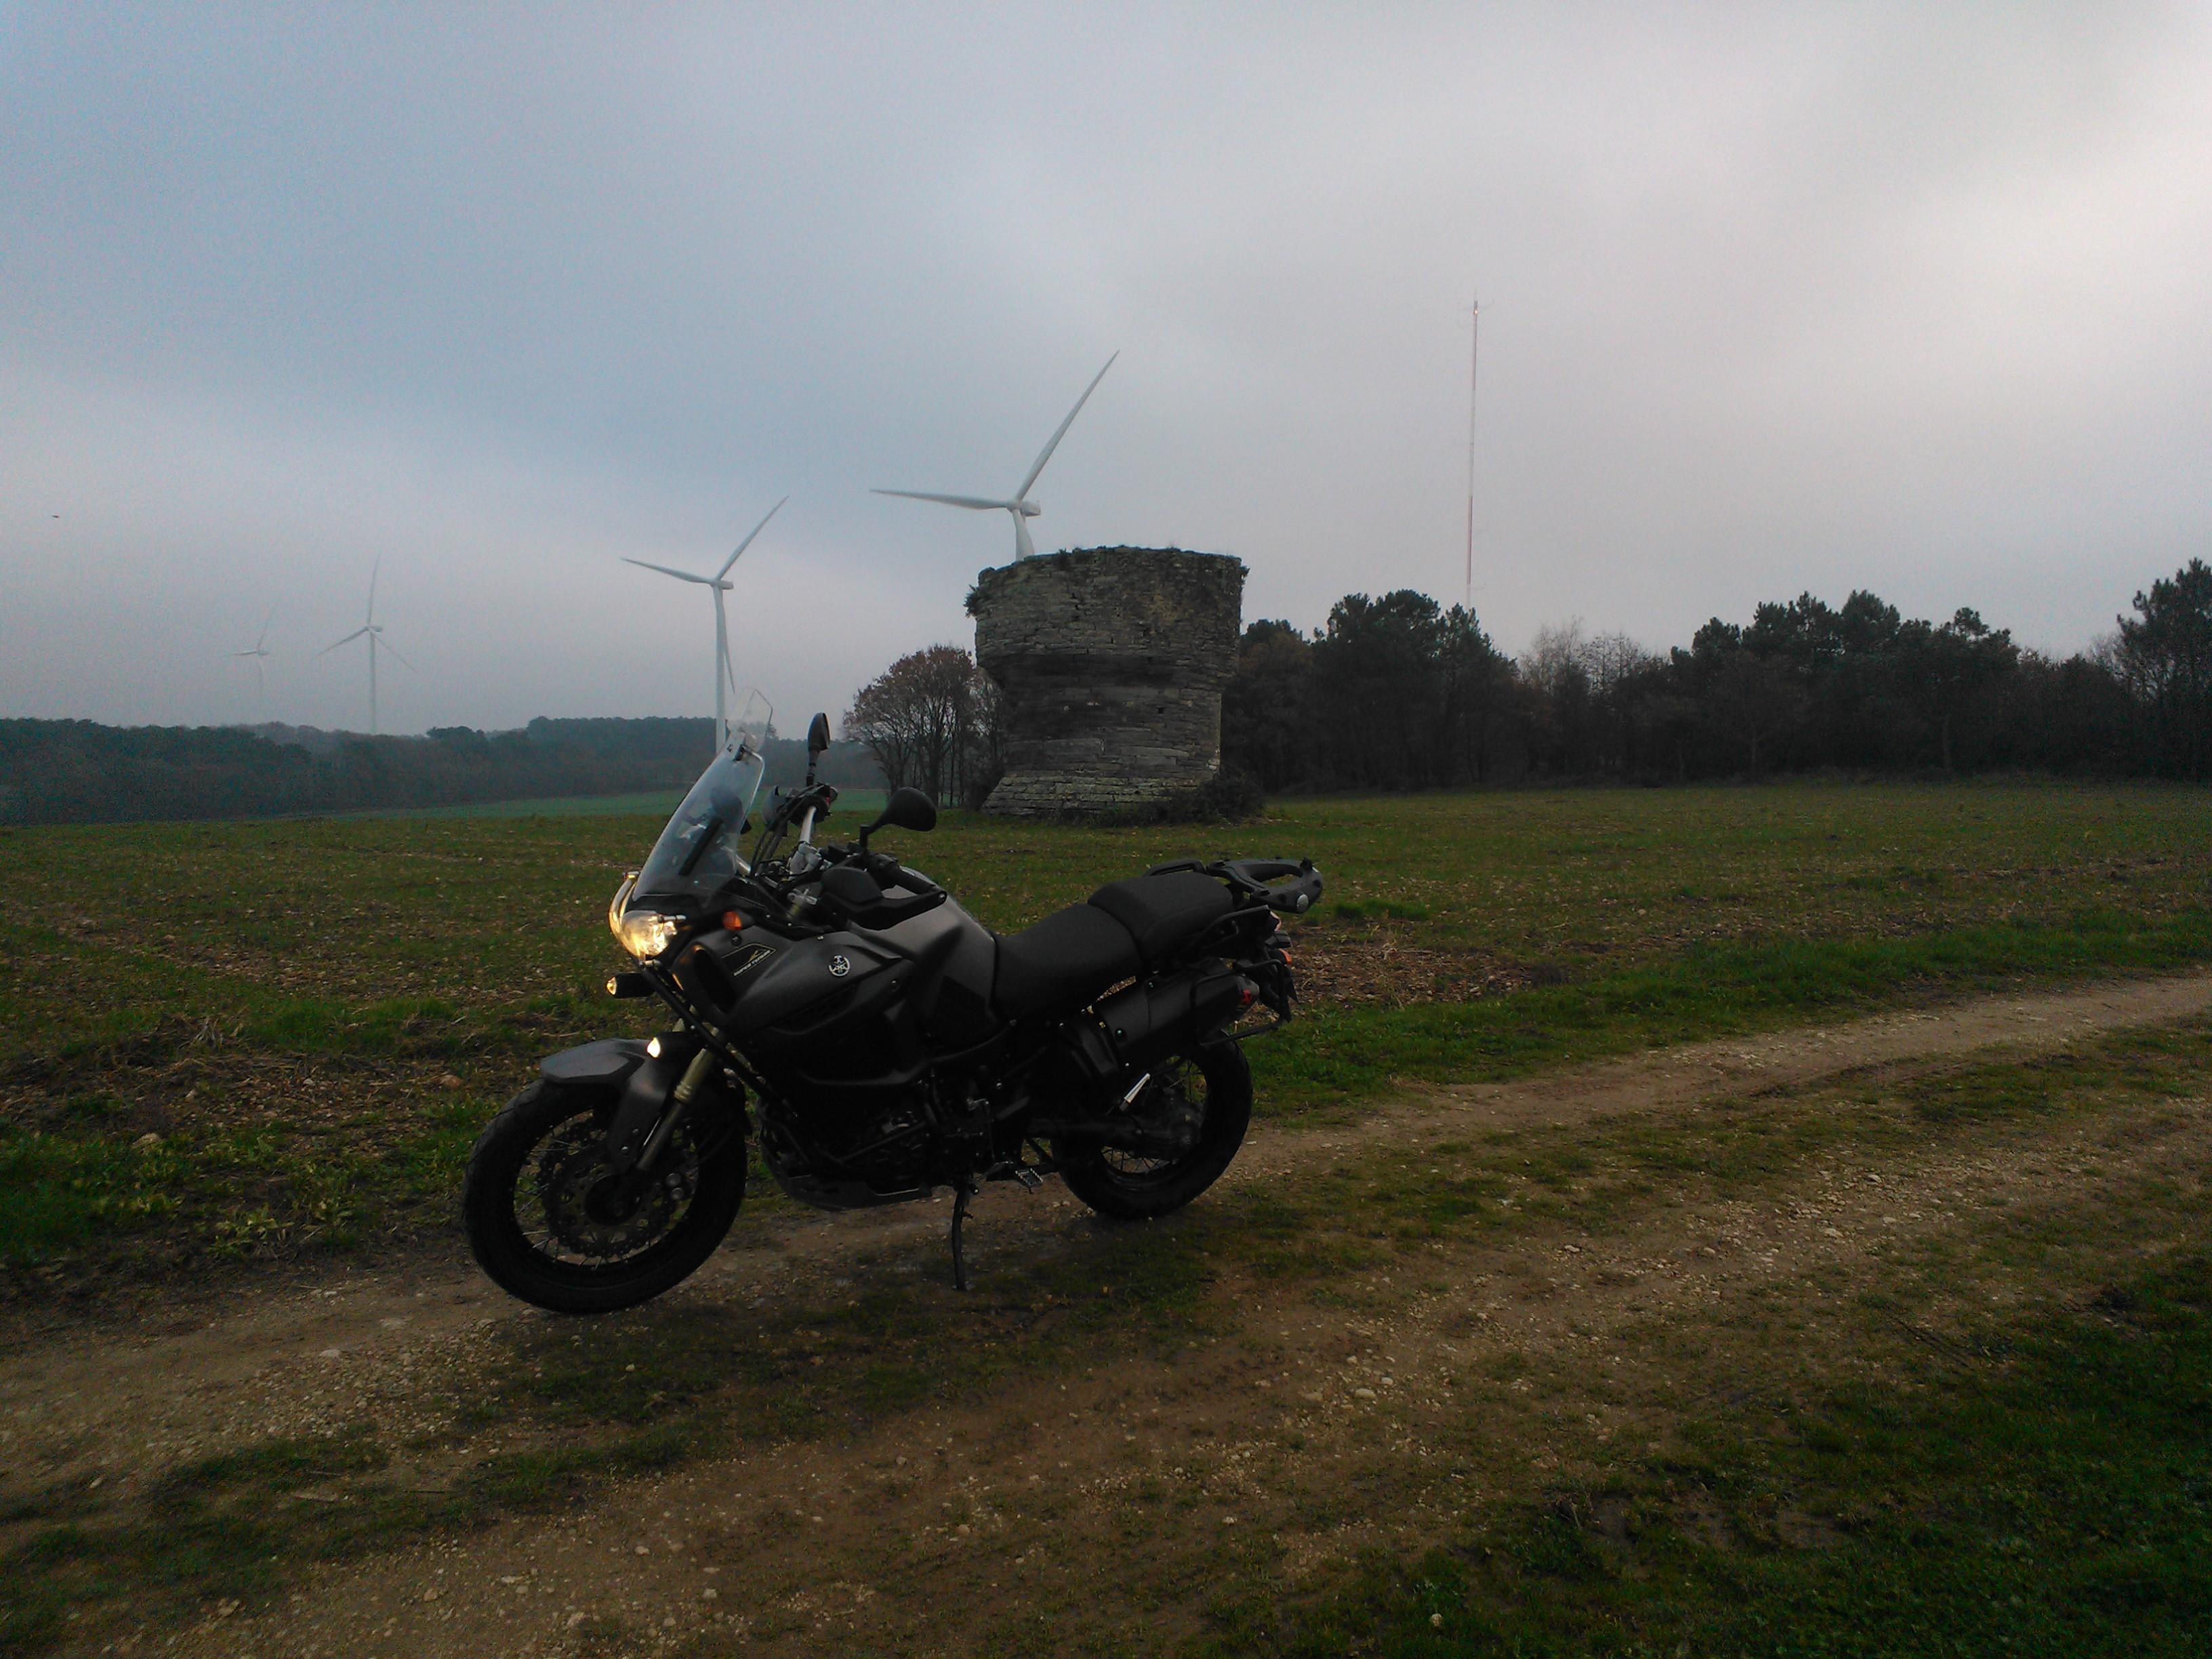 Balade dans les champs en Bretagne 578683WP20141130